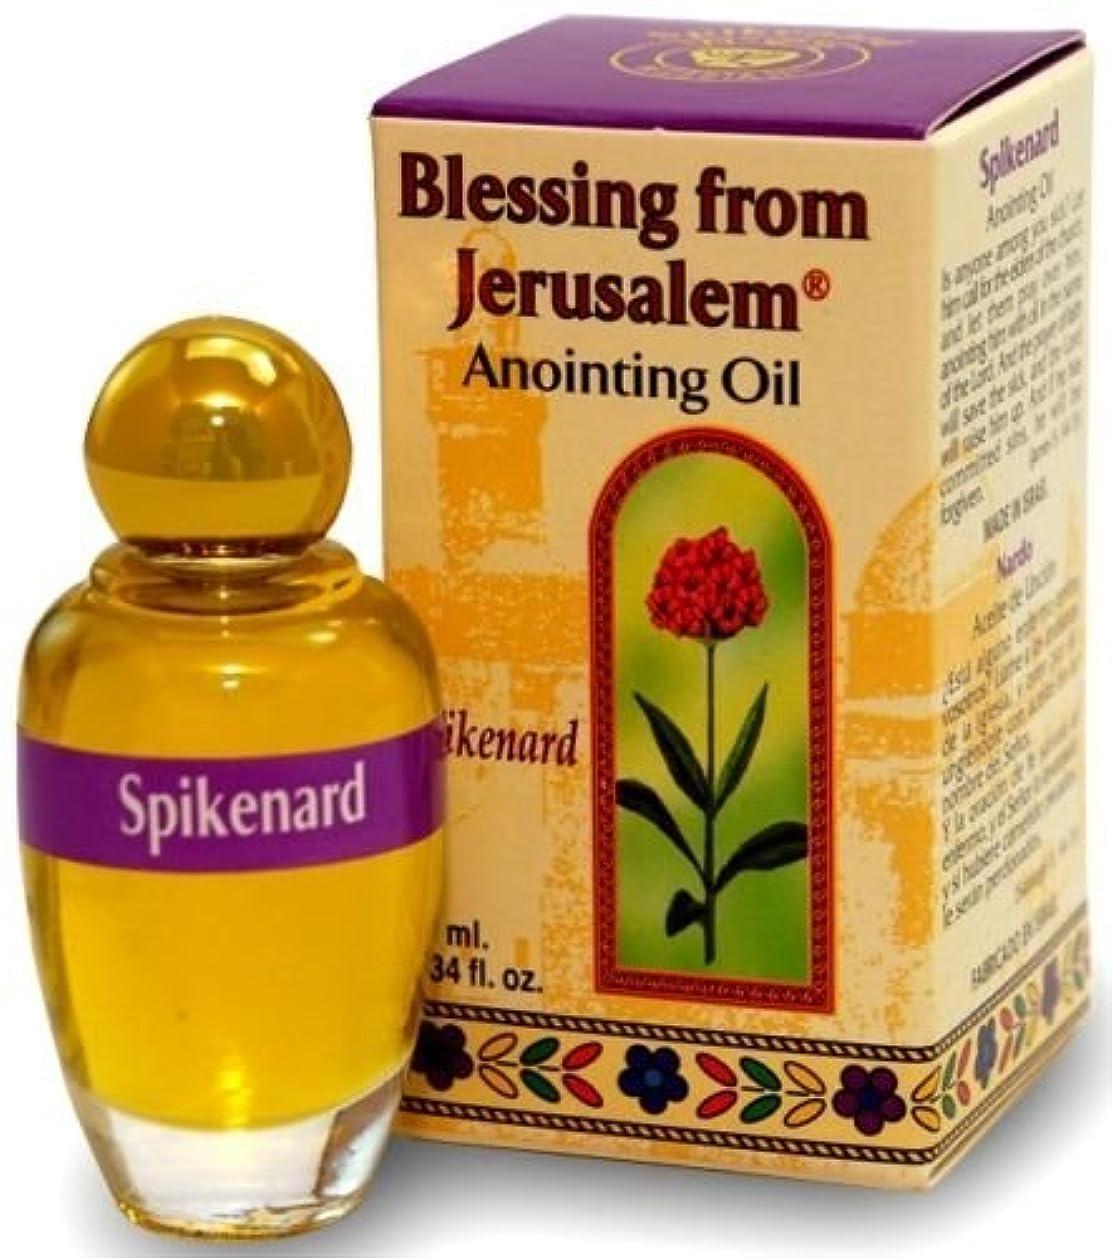 Spikenard – BlessingからエルサレムAnointingオイル – 10 ml ( .34 FLオンス) byベツレヘムギフトTM